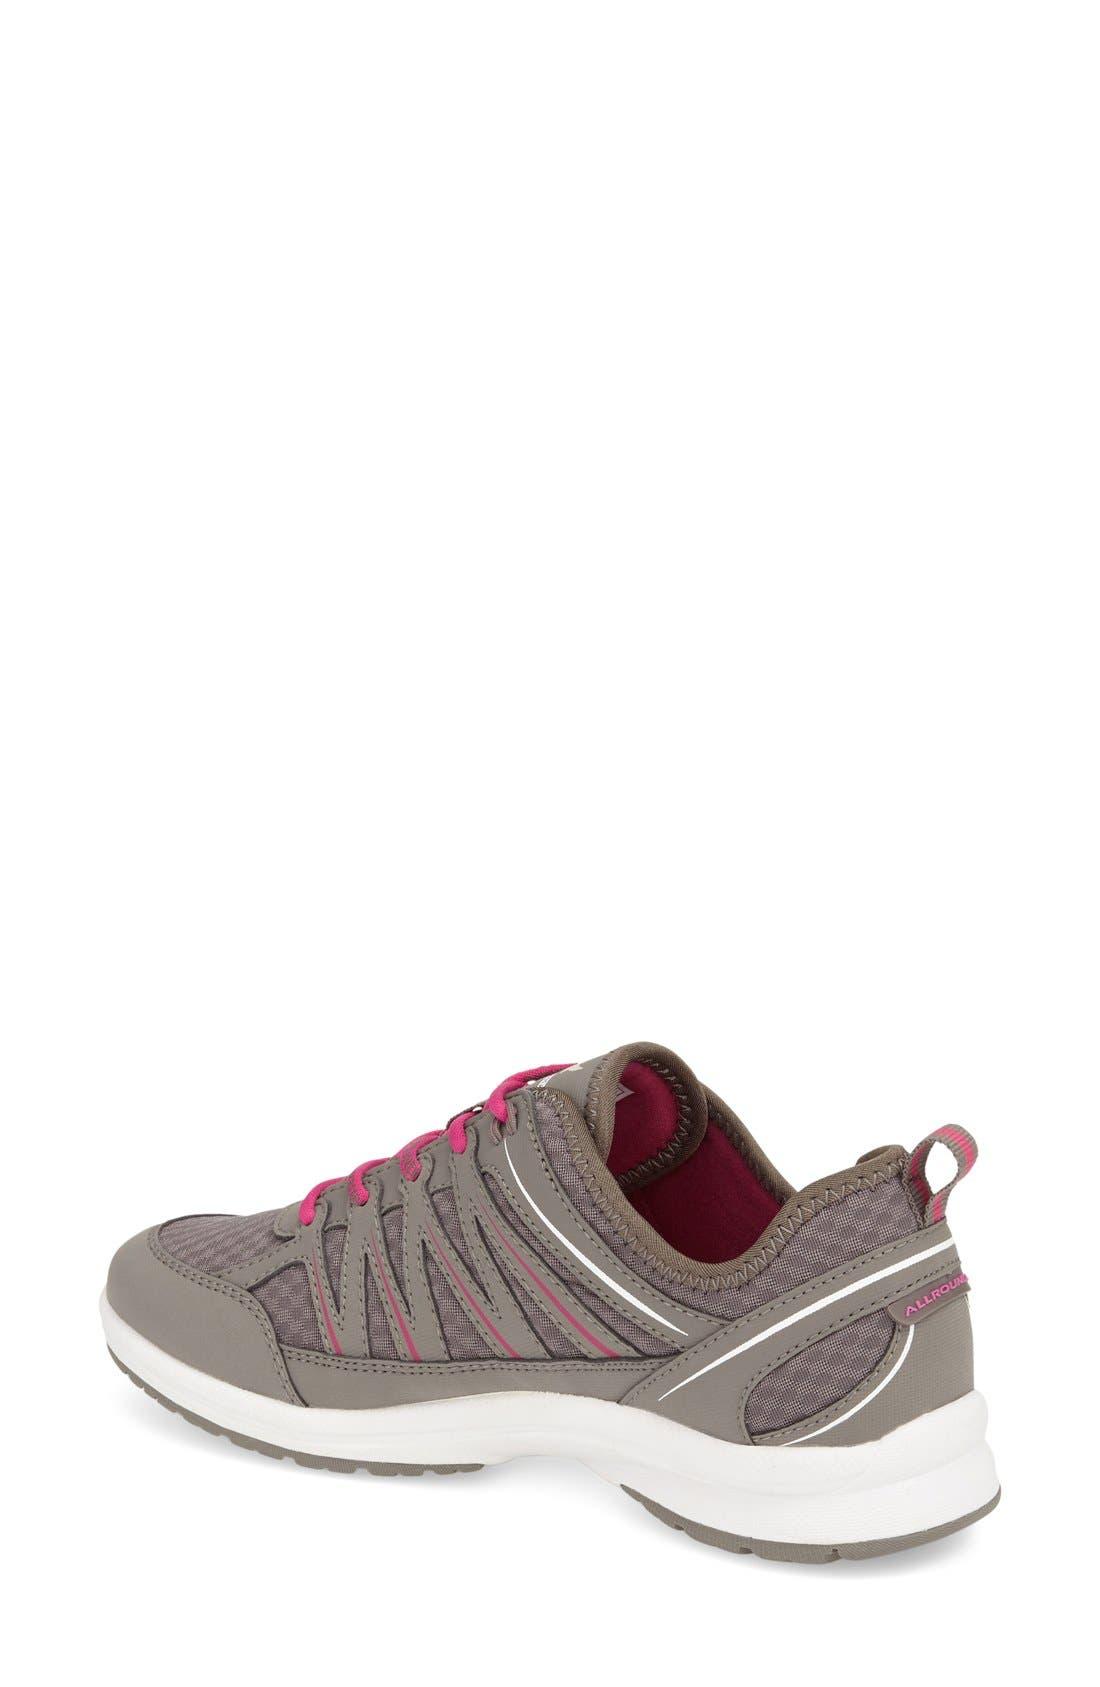 Alternate Image 4  - Allrounder by Mephisto 'Darina' Sneaker (Women)